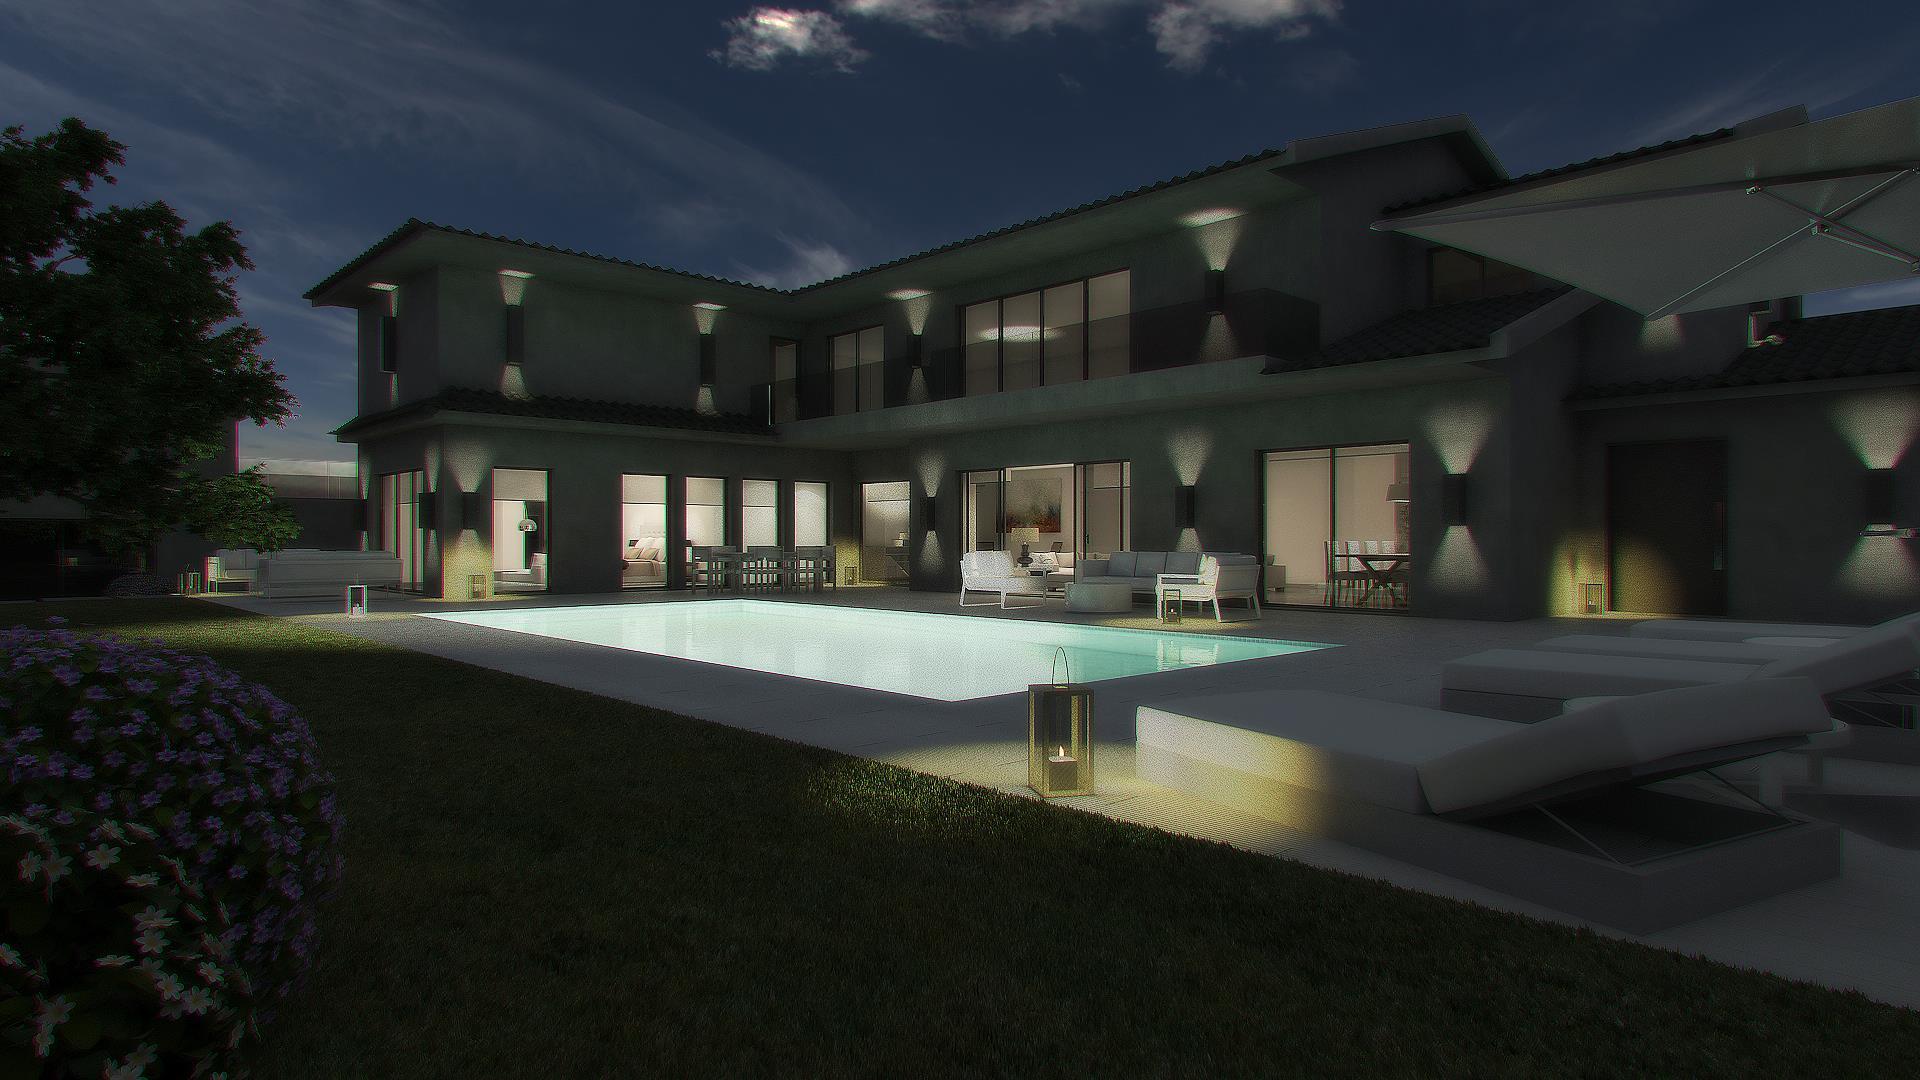 Villa per Vendita alle ore Detached house, 6 bedrooms, for Sale Cascais, Lisbona, - Portogallo